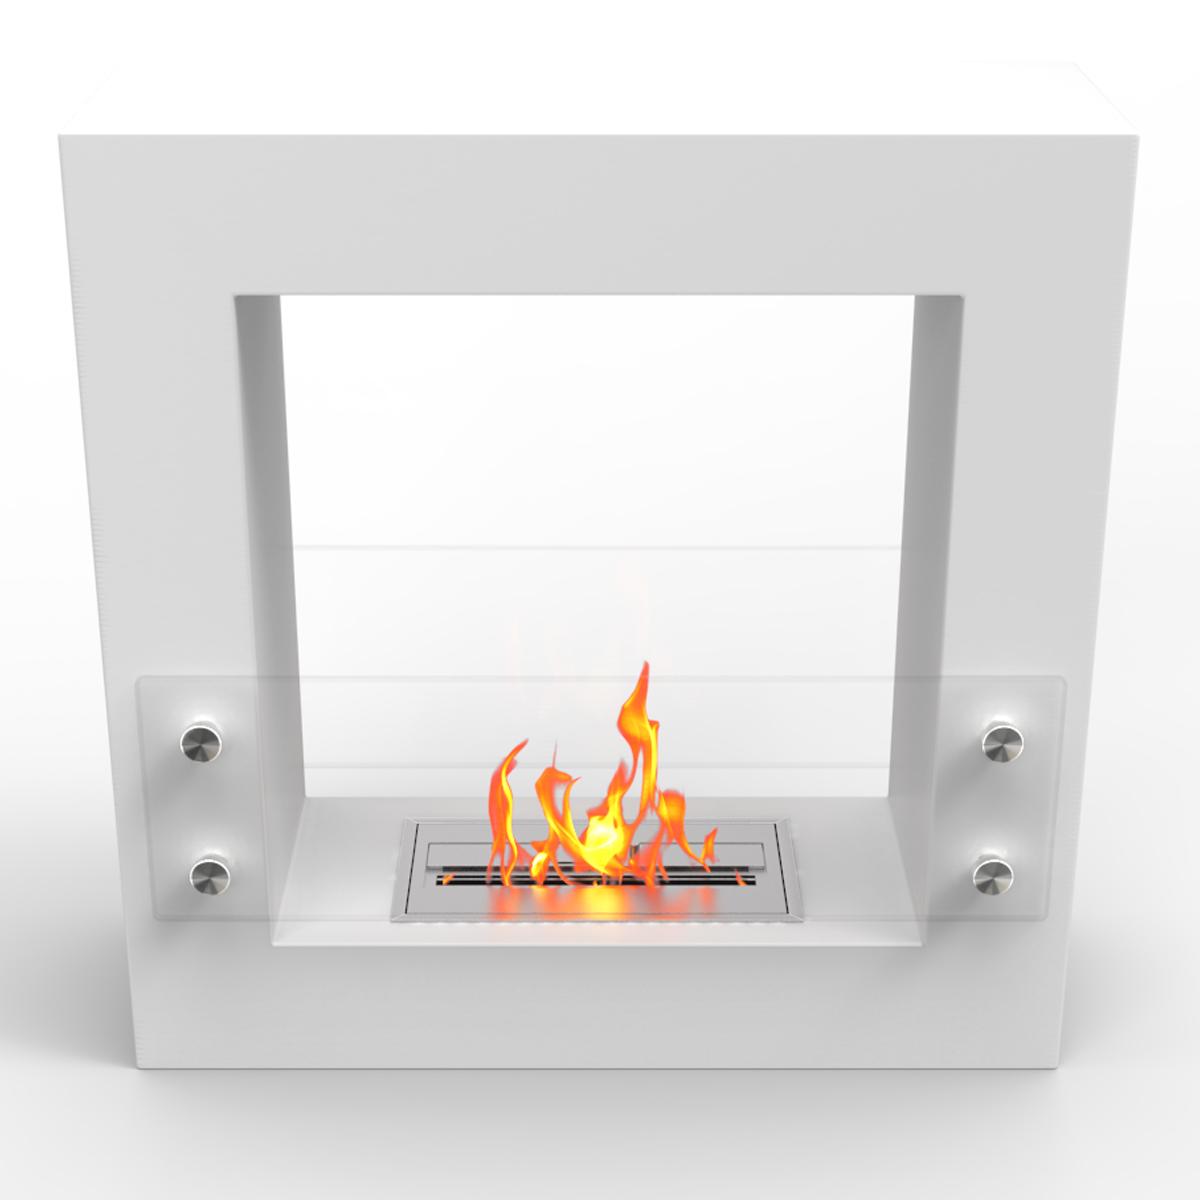 Dora Ventless Free Standing Ethanol Fireplace In White